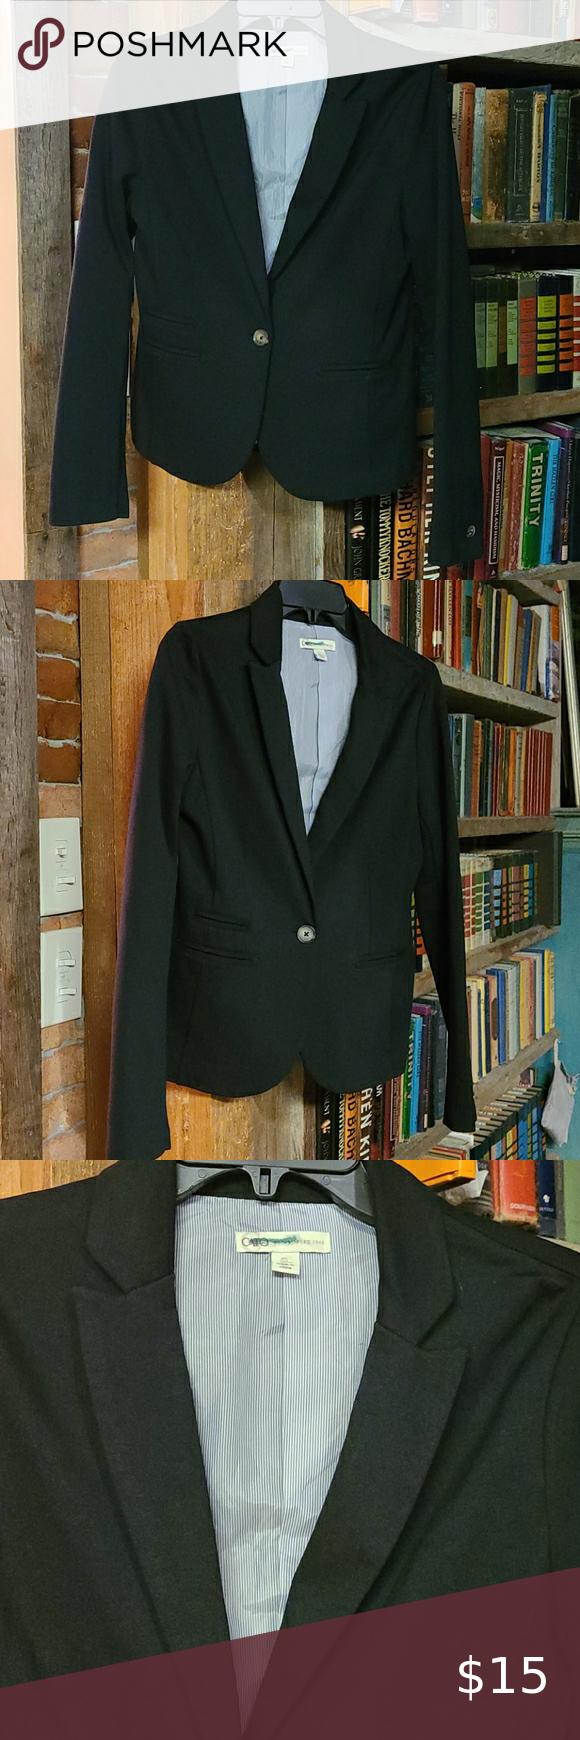 Cato Suit Jacket Size Small Black Suit Jacket Coats Jackets Women Dot Jacket [ 1740 x 580 Pixel ]